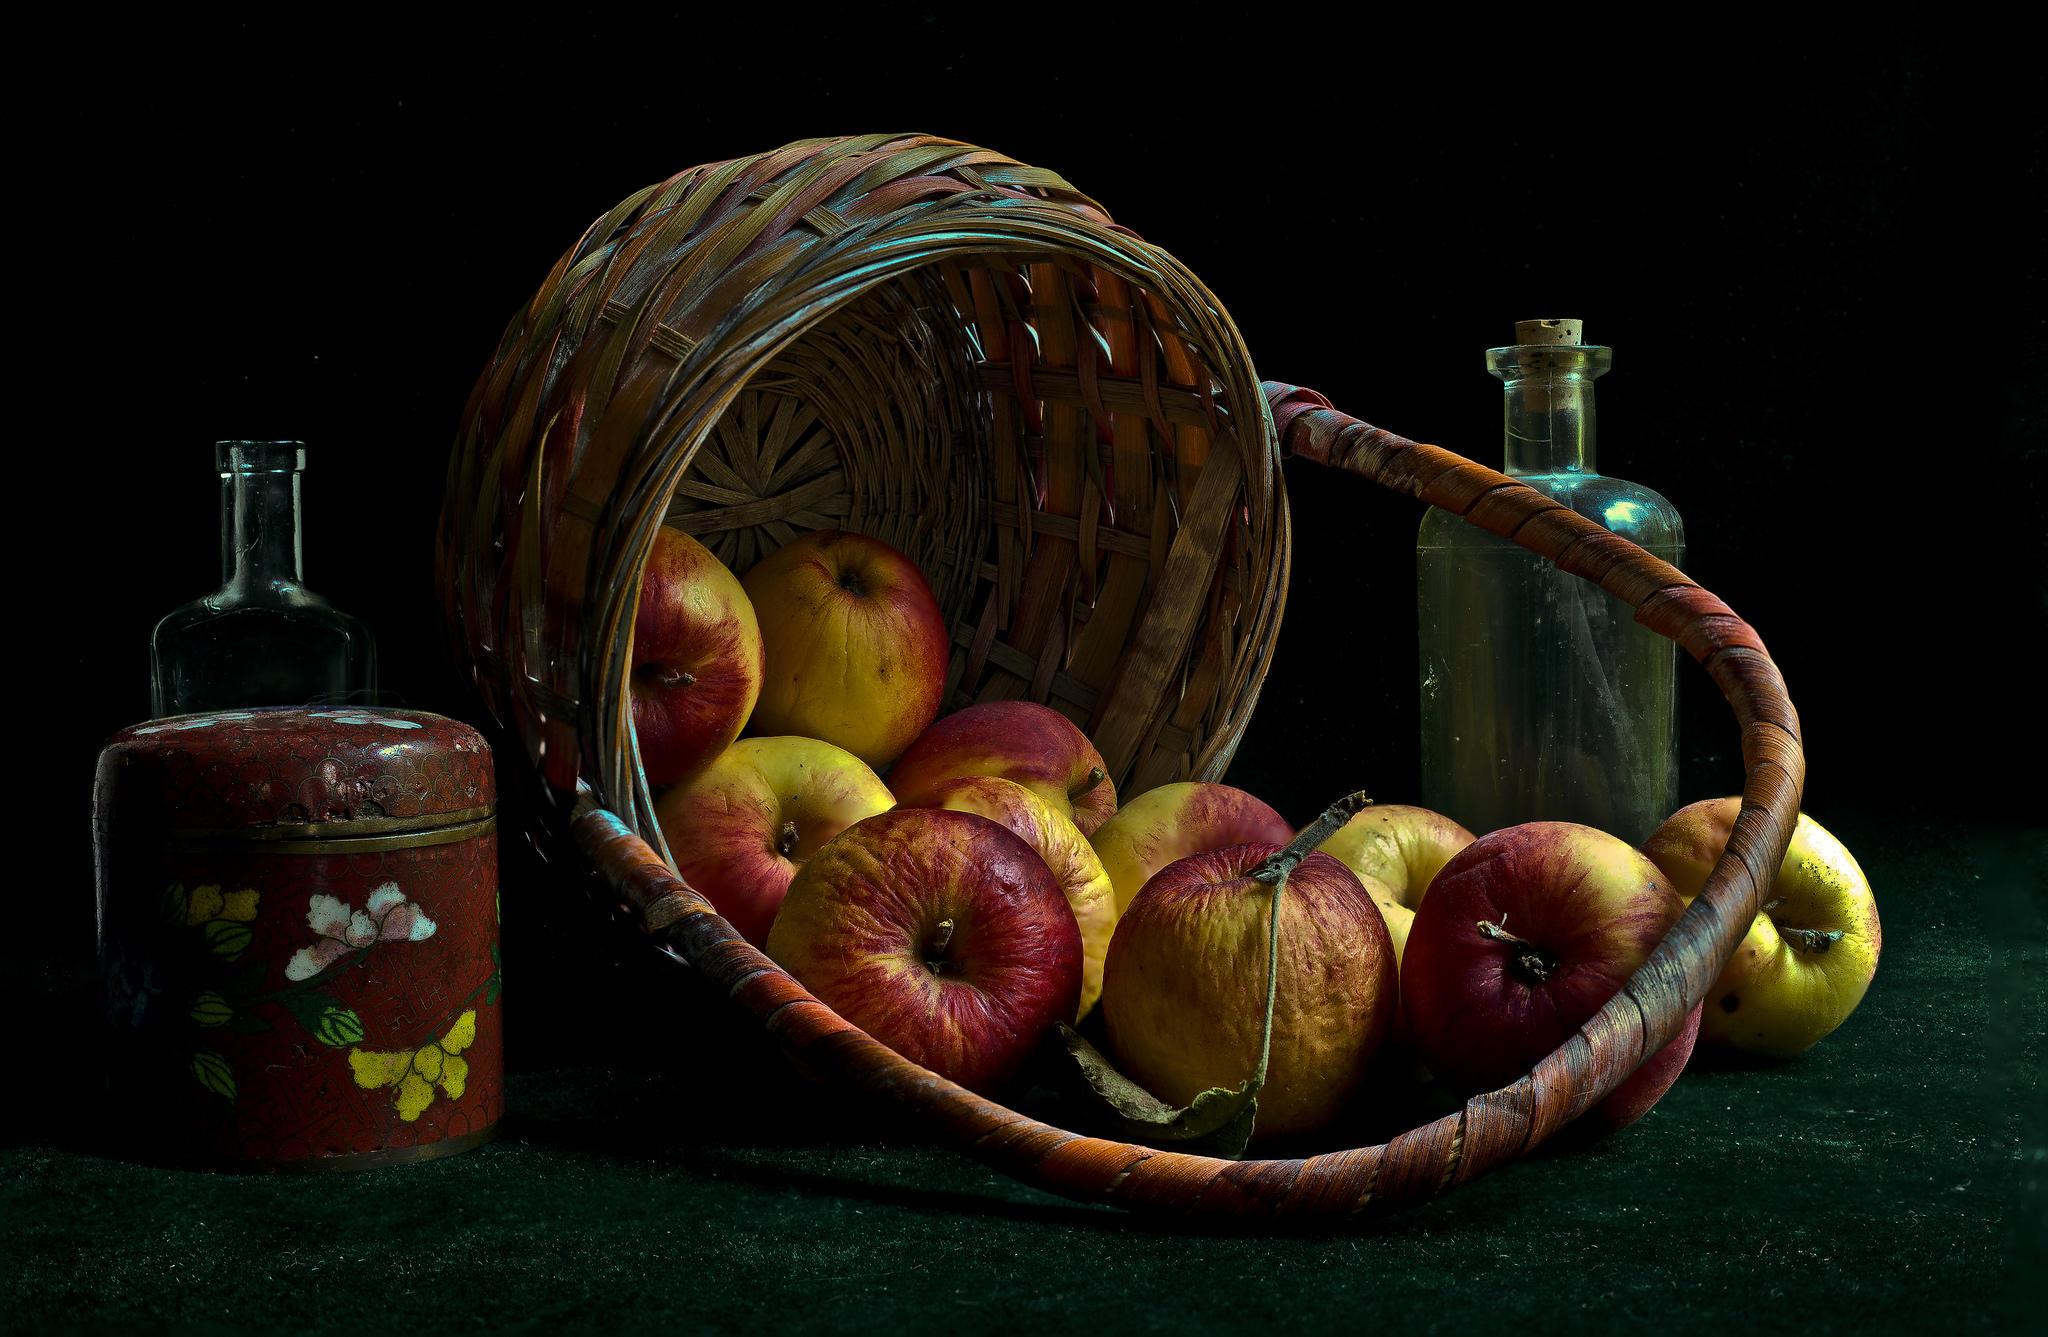 обои корзина, яблоки, фрукты, натюрморт картинки фото